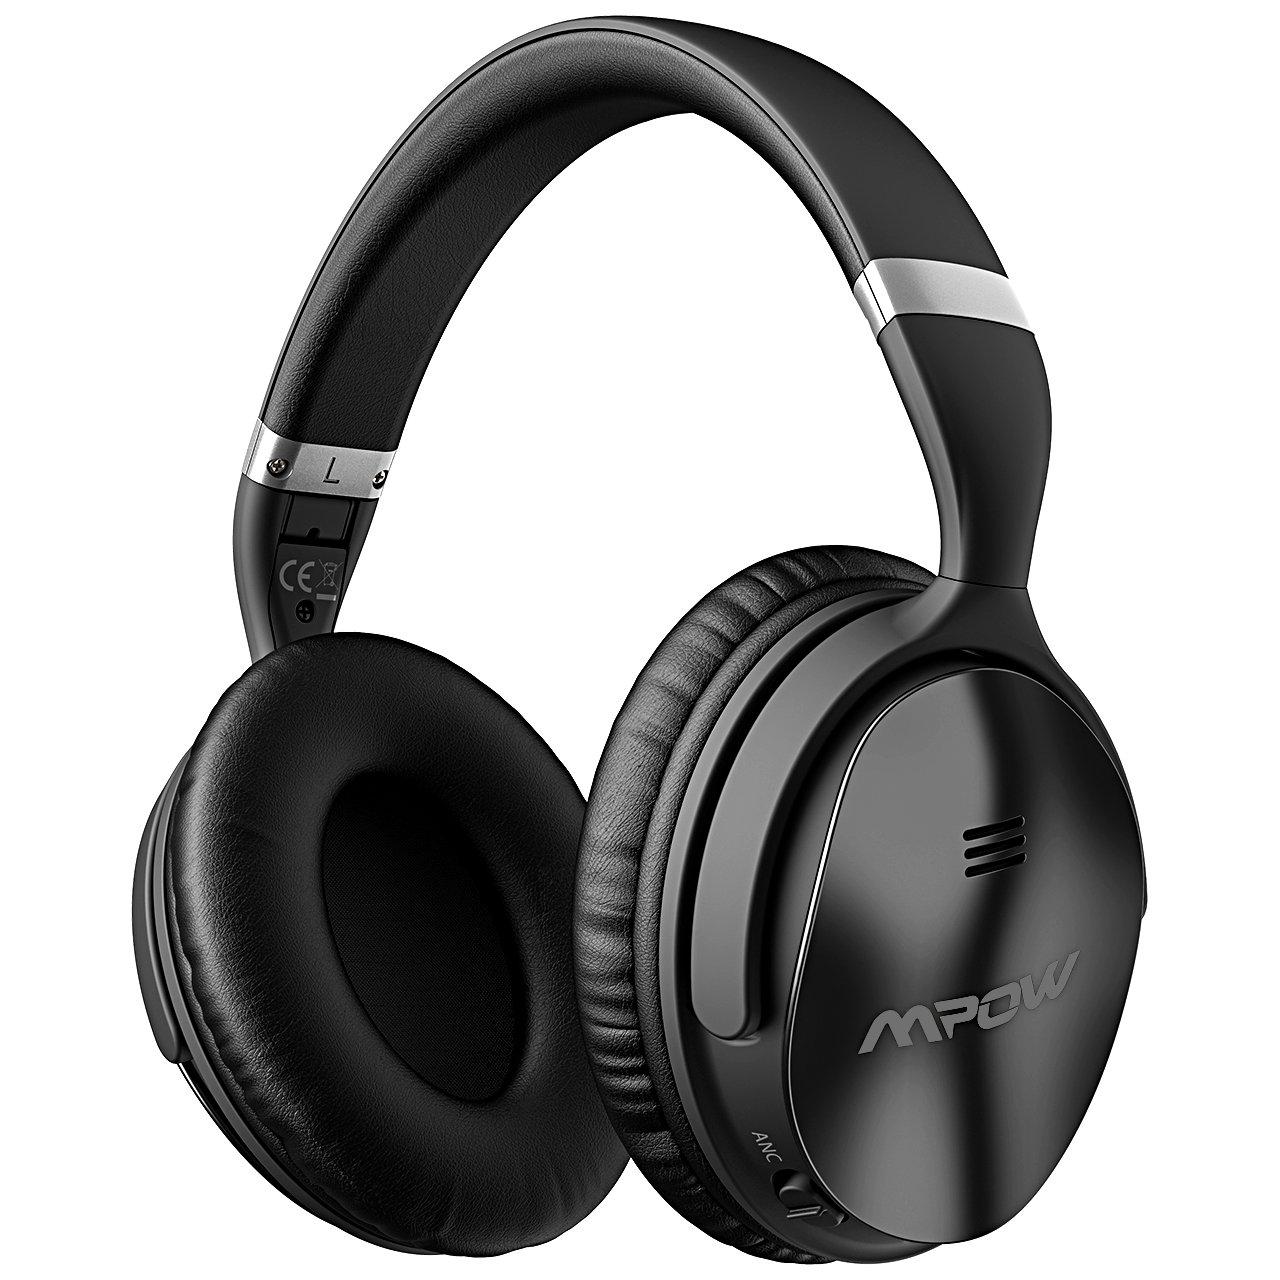 Auriculares Mpow Estereo Inalambrico Bluetooth (xmp)